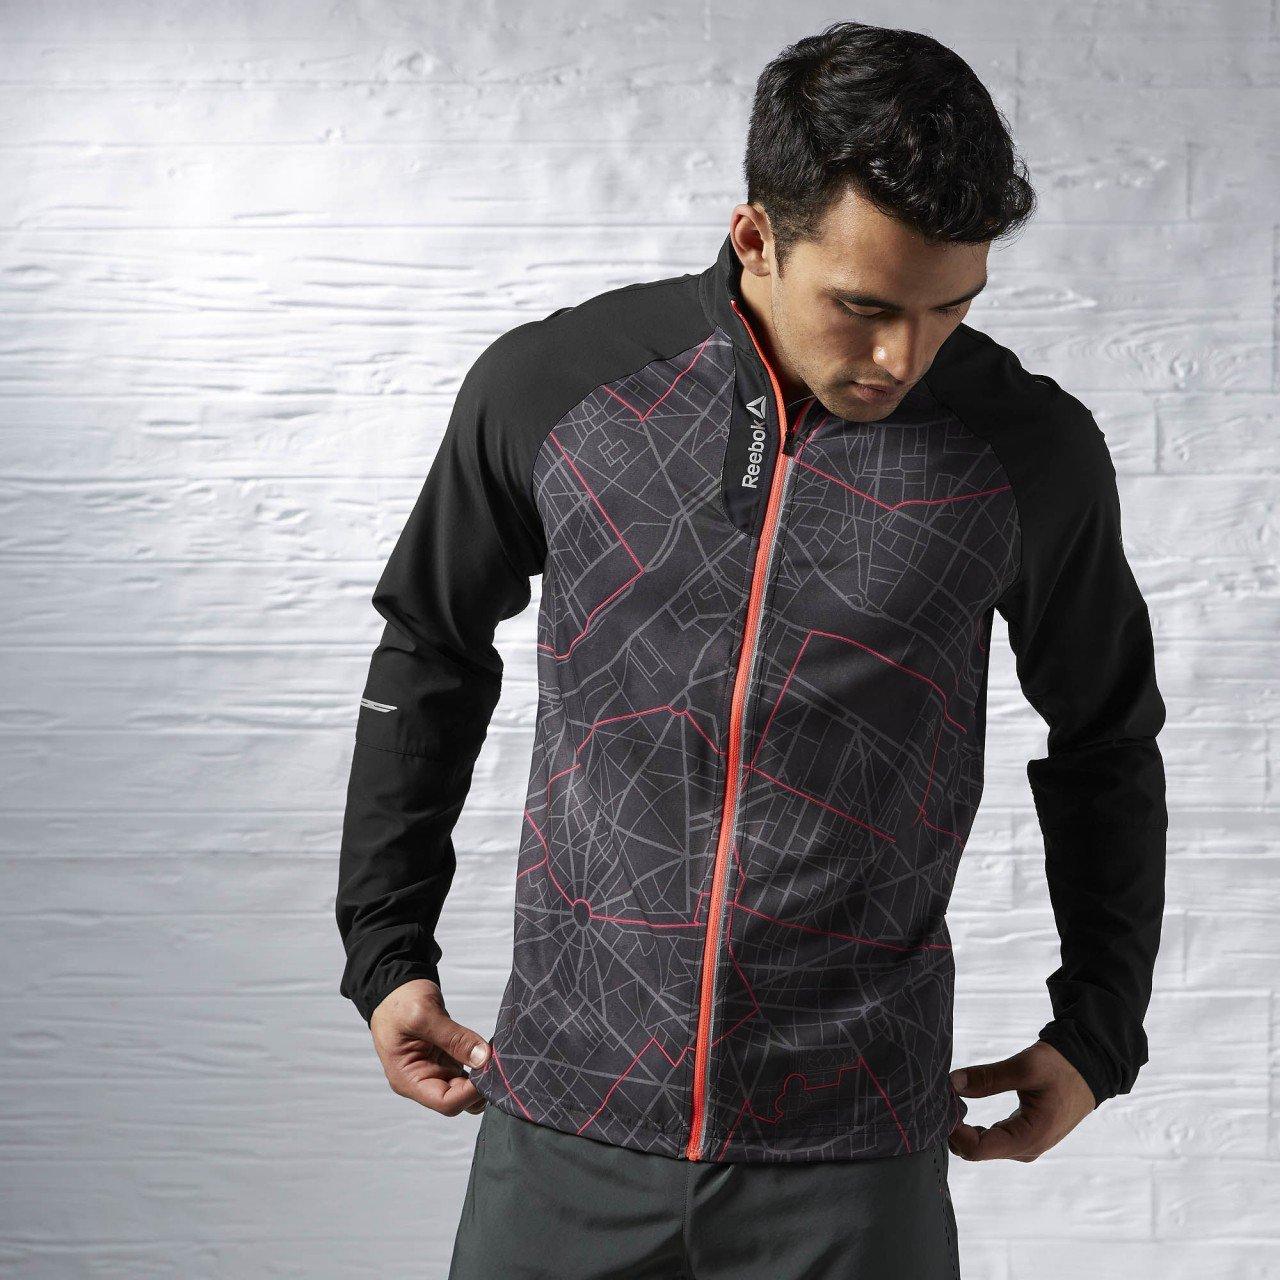 Reebok Osr Paris uomo sport running antivento giacca in tessuto, Uomo, Black, Red, S